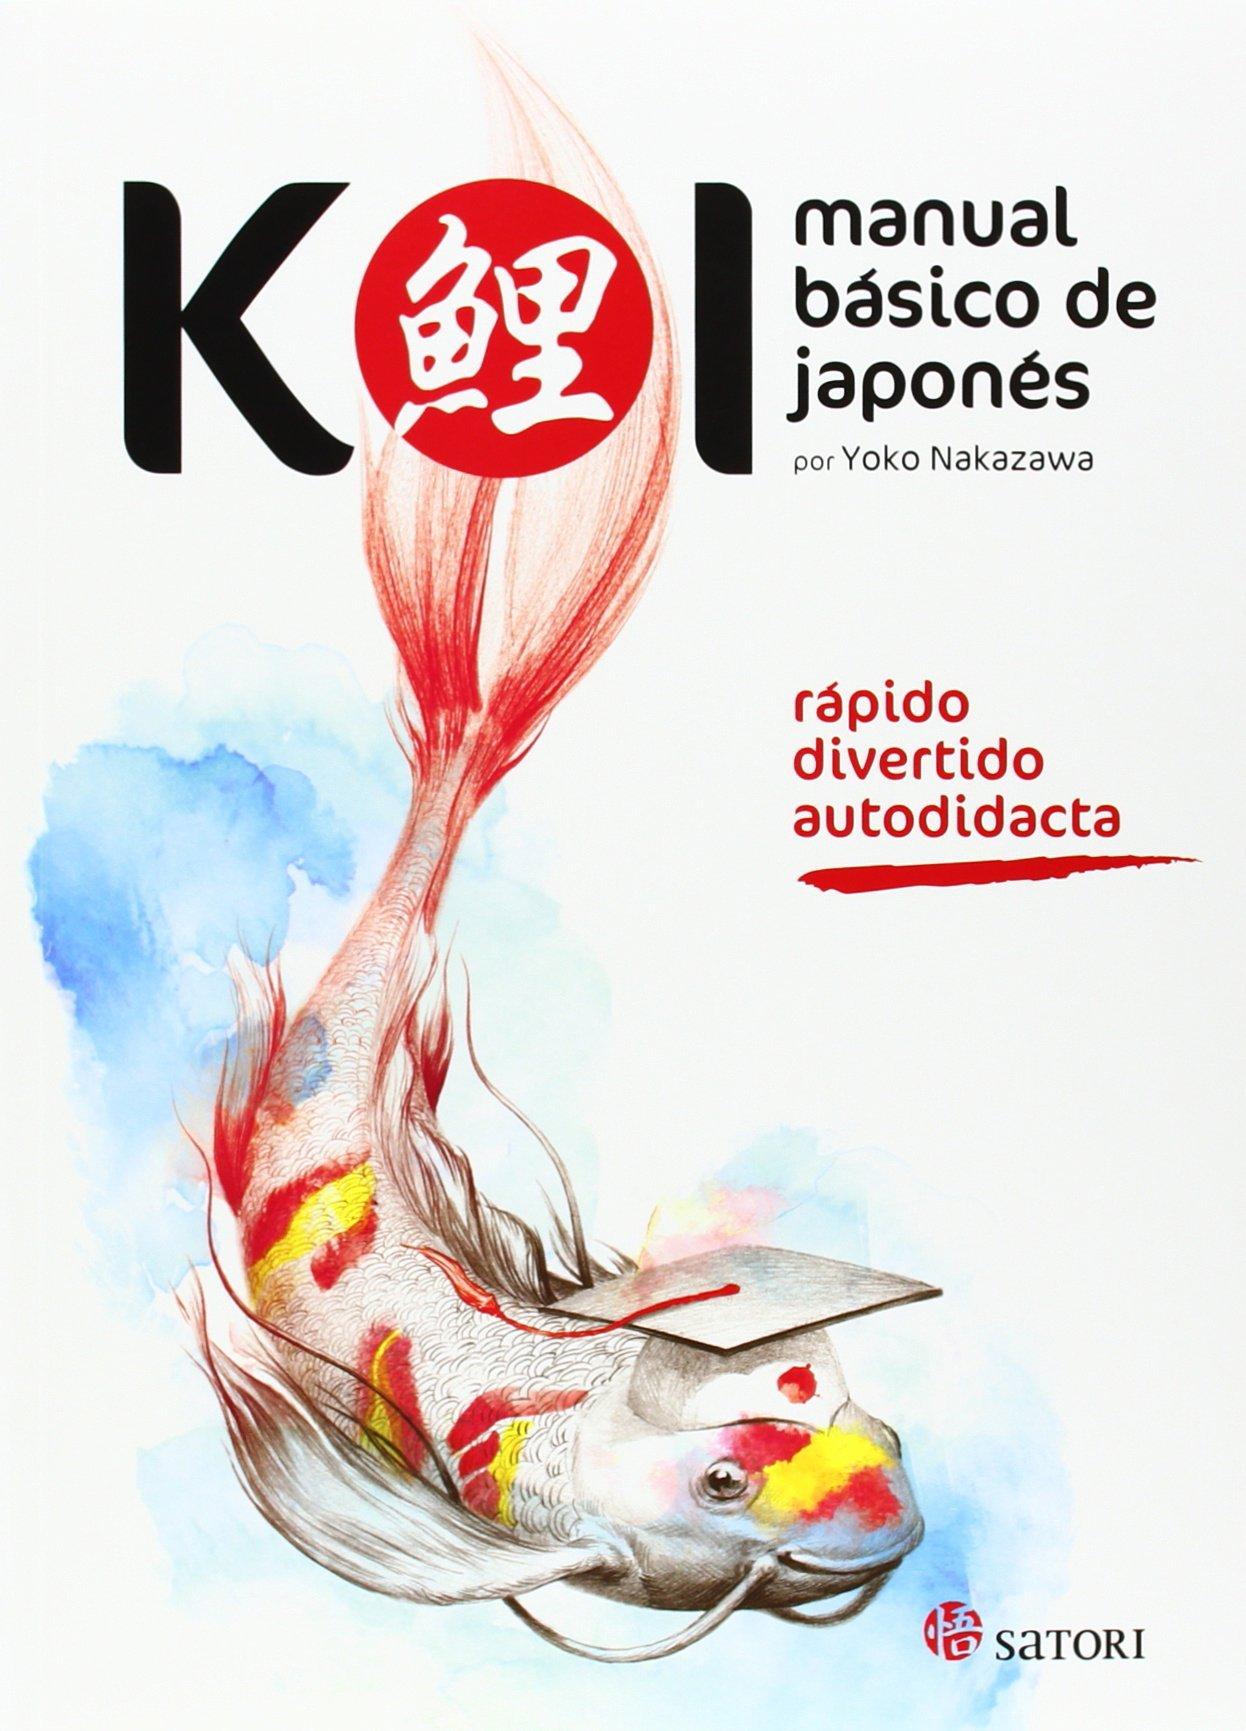 Koi. Manual básico de japonés (Idioma)